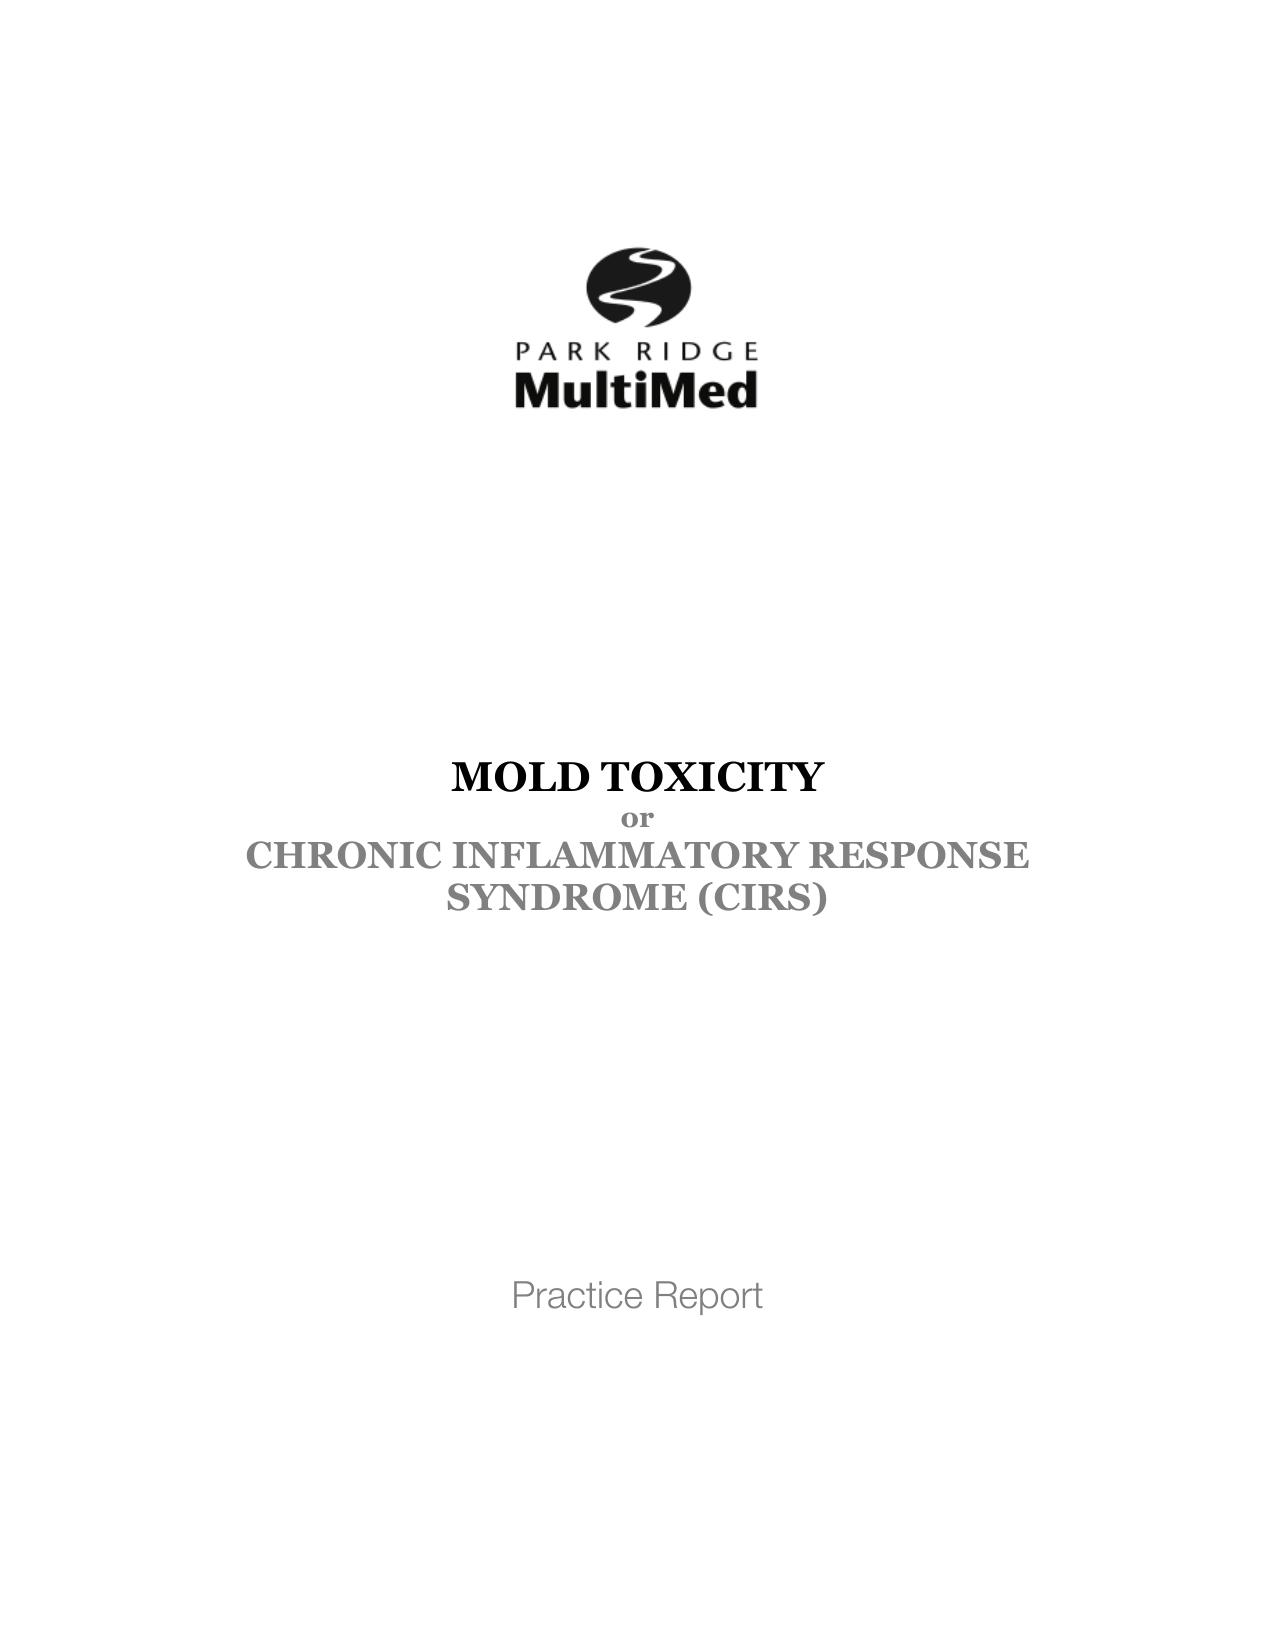 MOLD TOXICITY - Park Ridge MultiMed